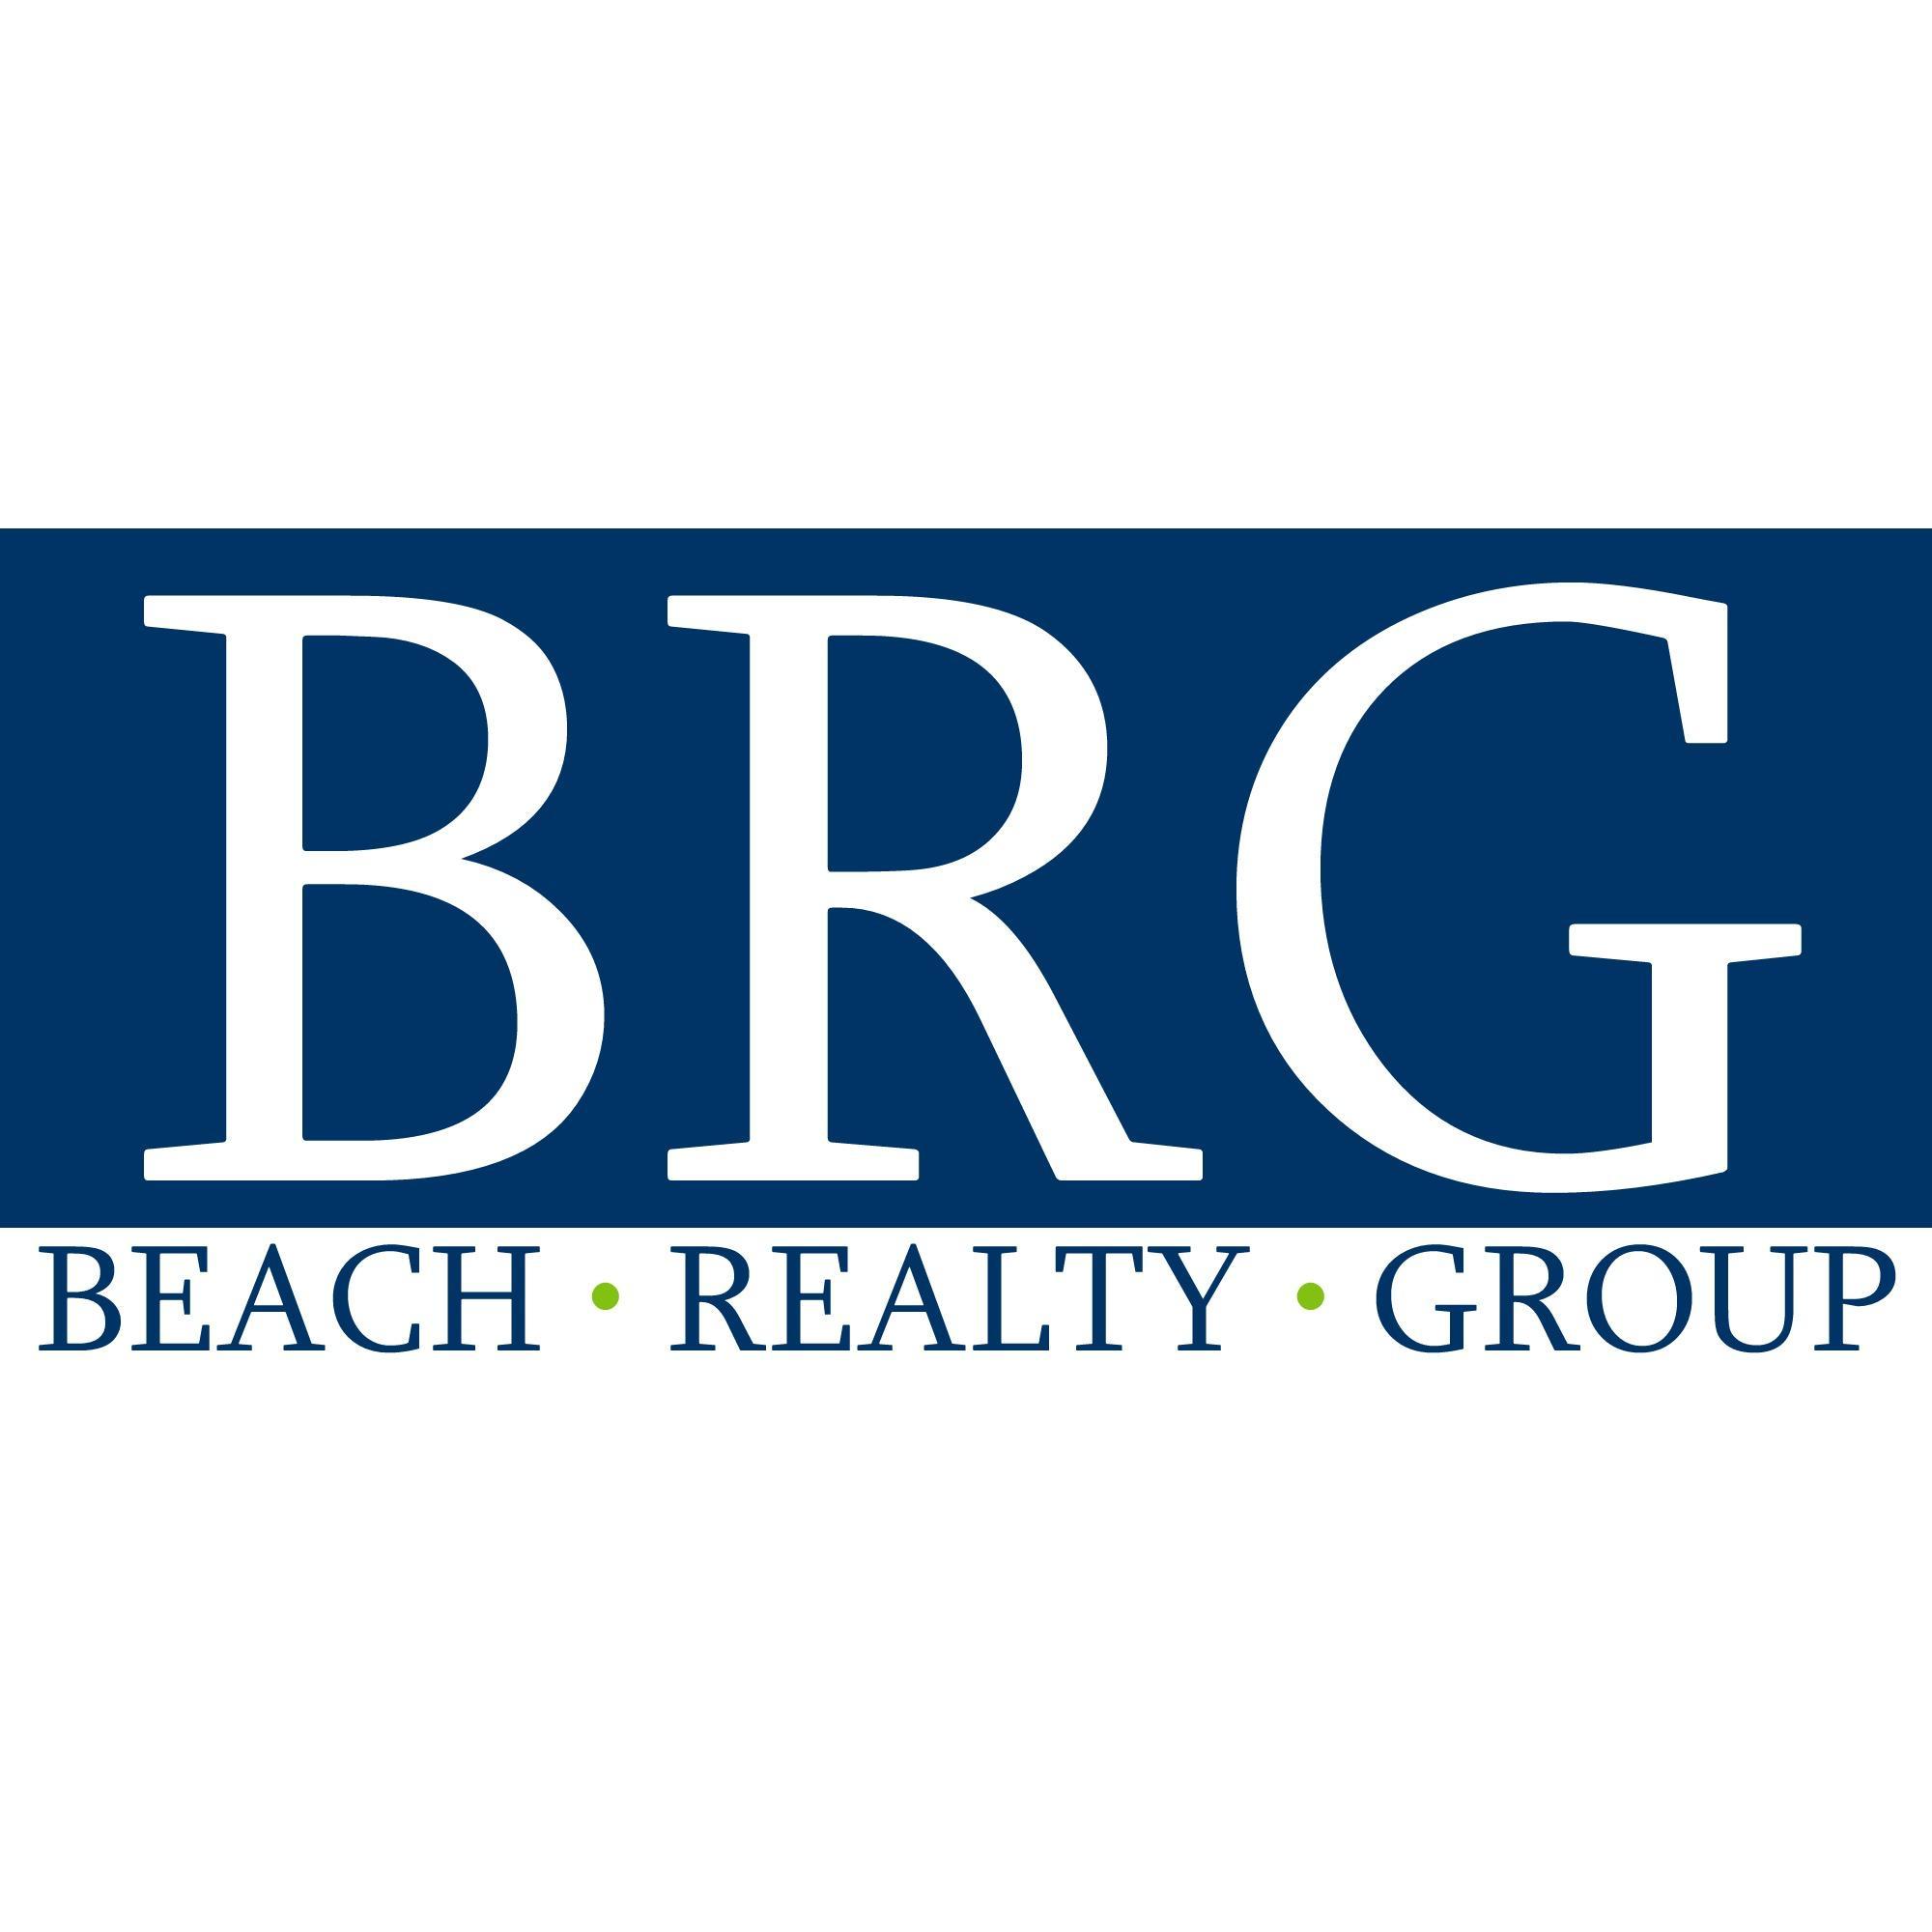 Beach Realty Group